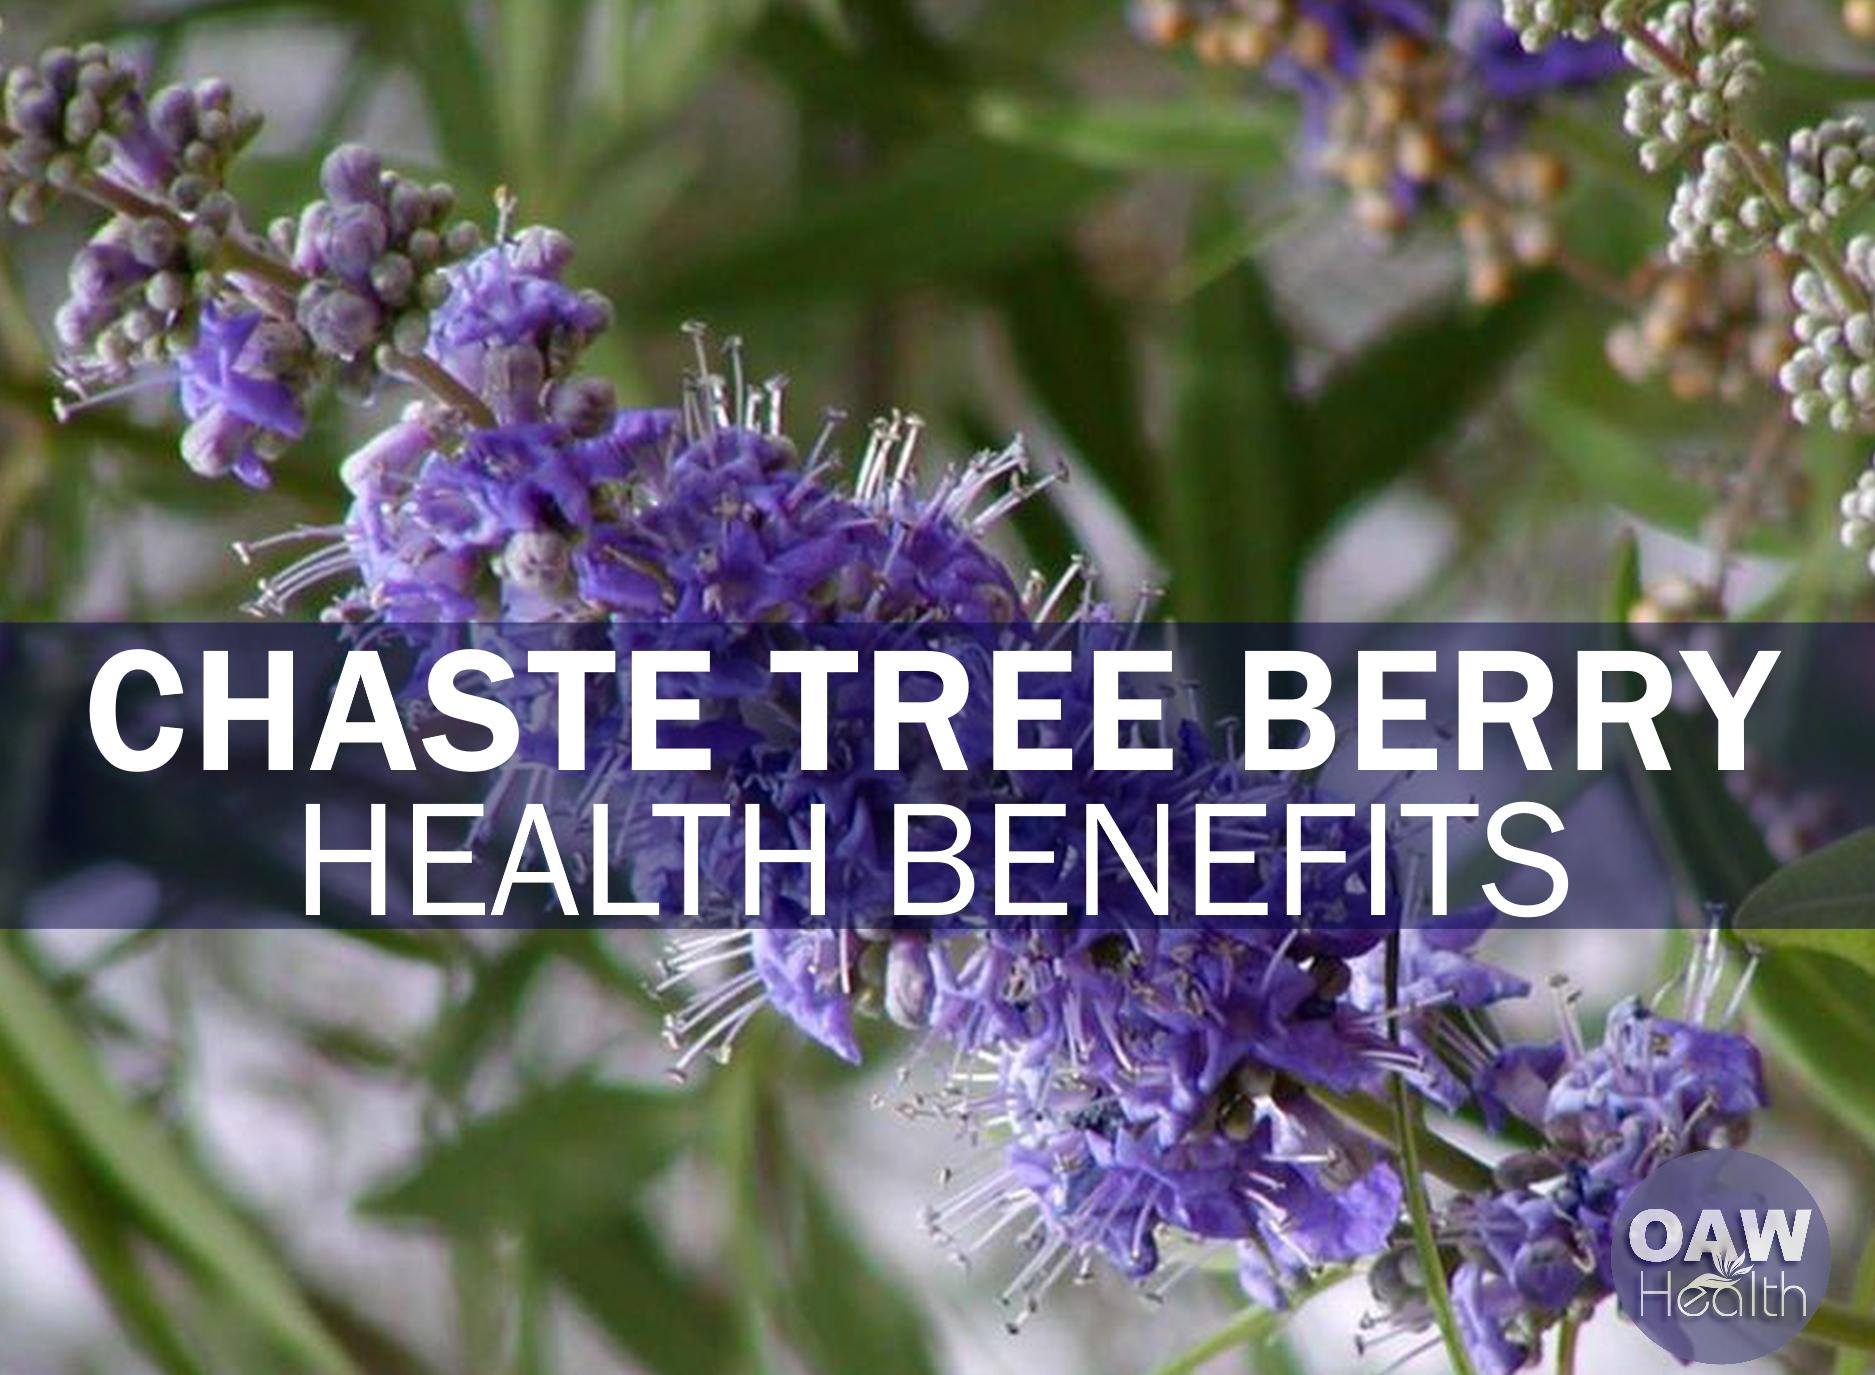 23 Amazing Health Benefits of Chaste Tree Berry